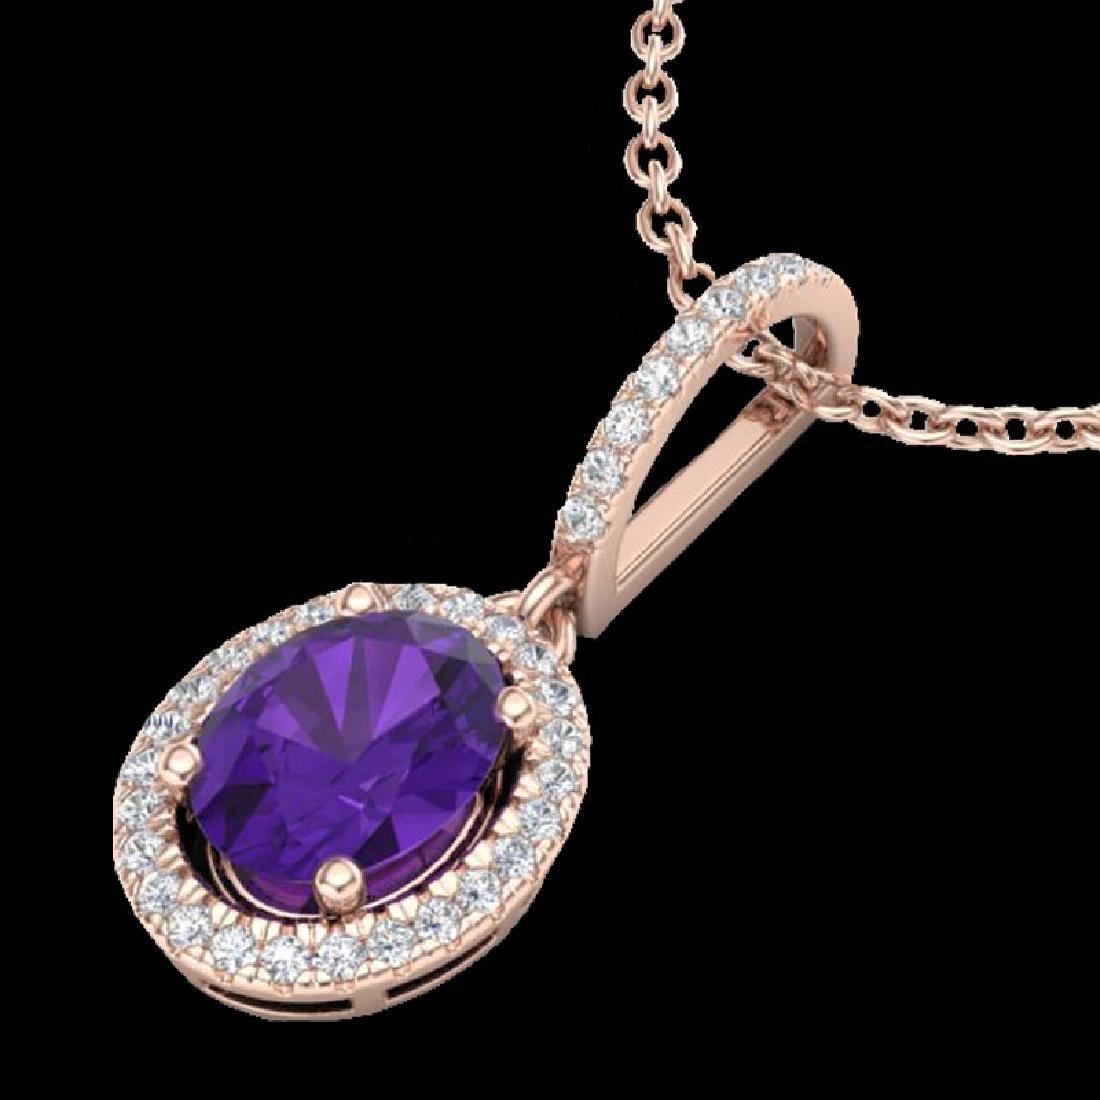 1.75 CTW Amethyst & Micro Pave VS/SI Diamond Necklace - 2